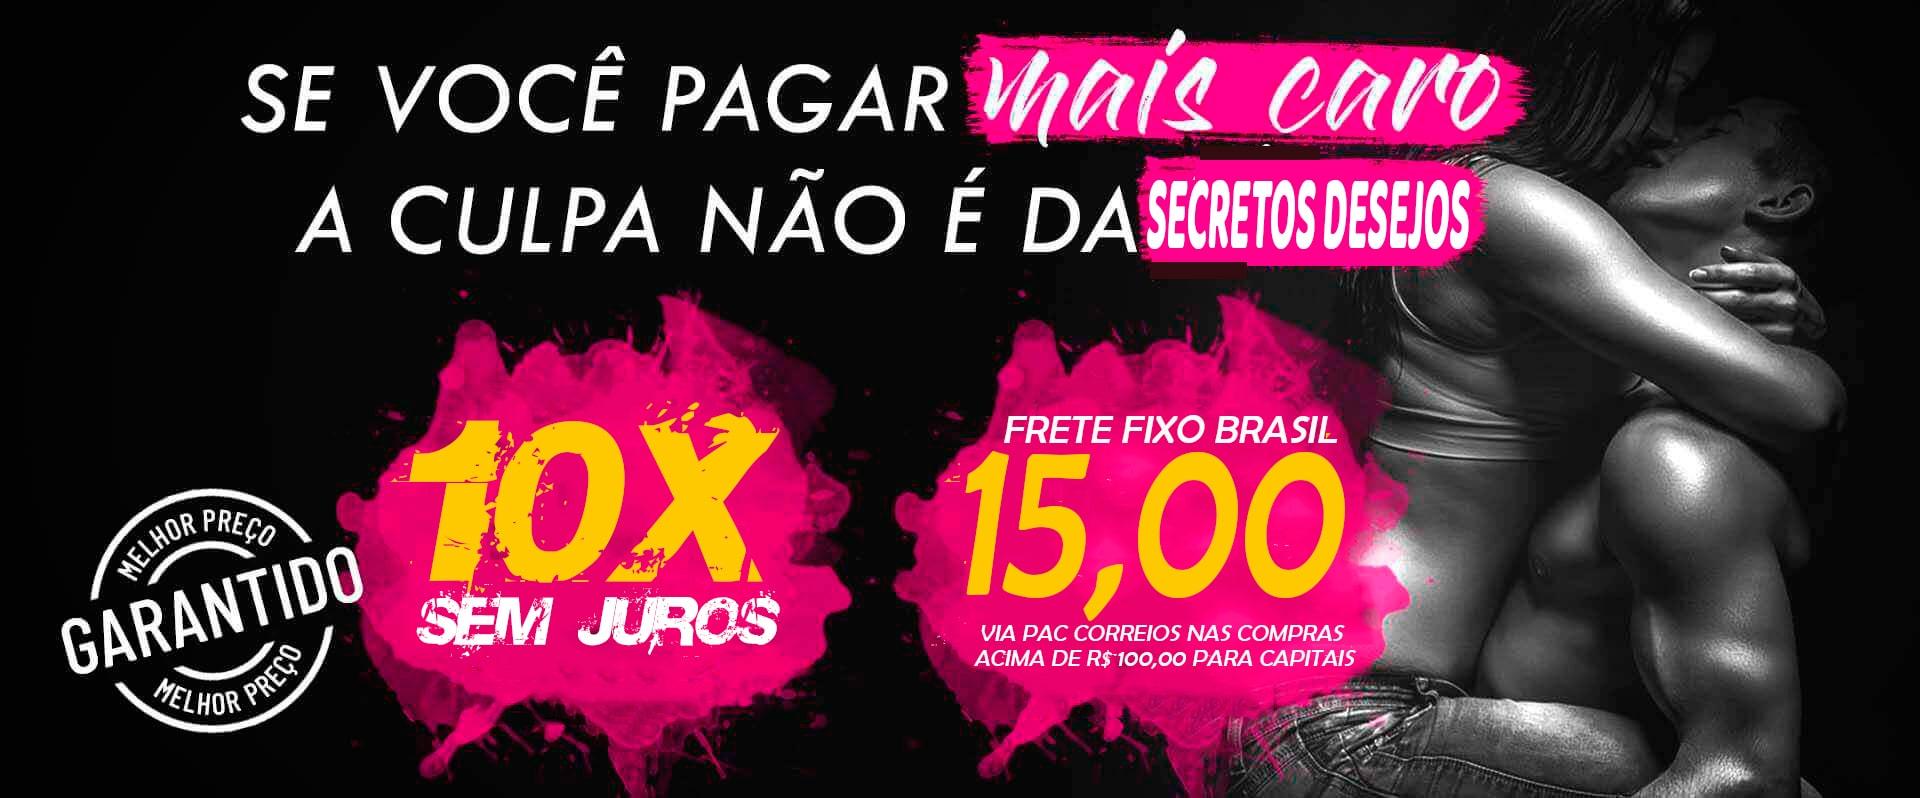 Frete fixo Brasil Sex shop